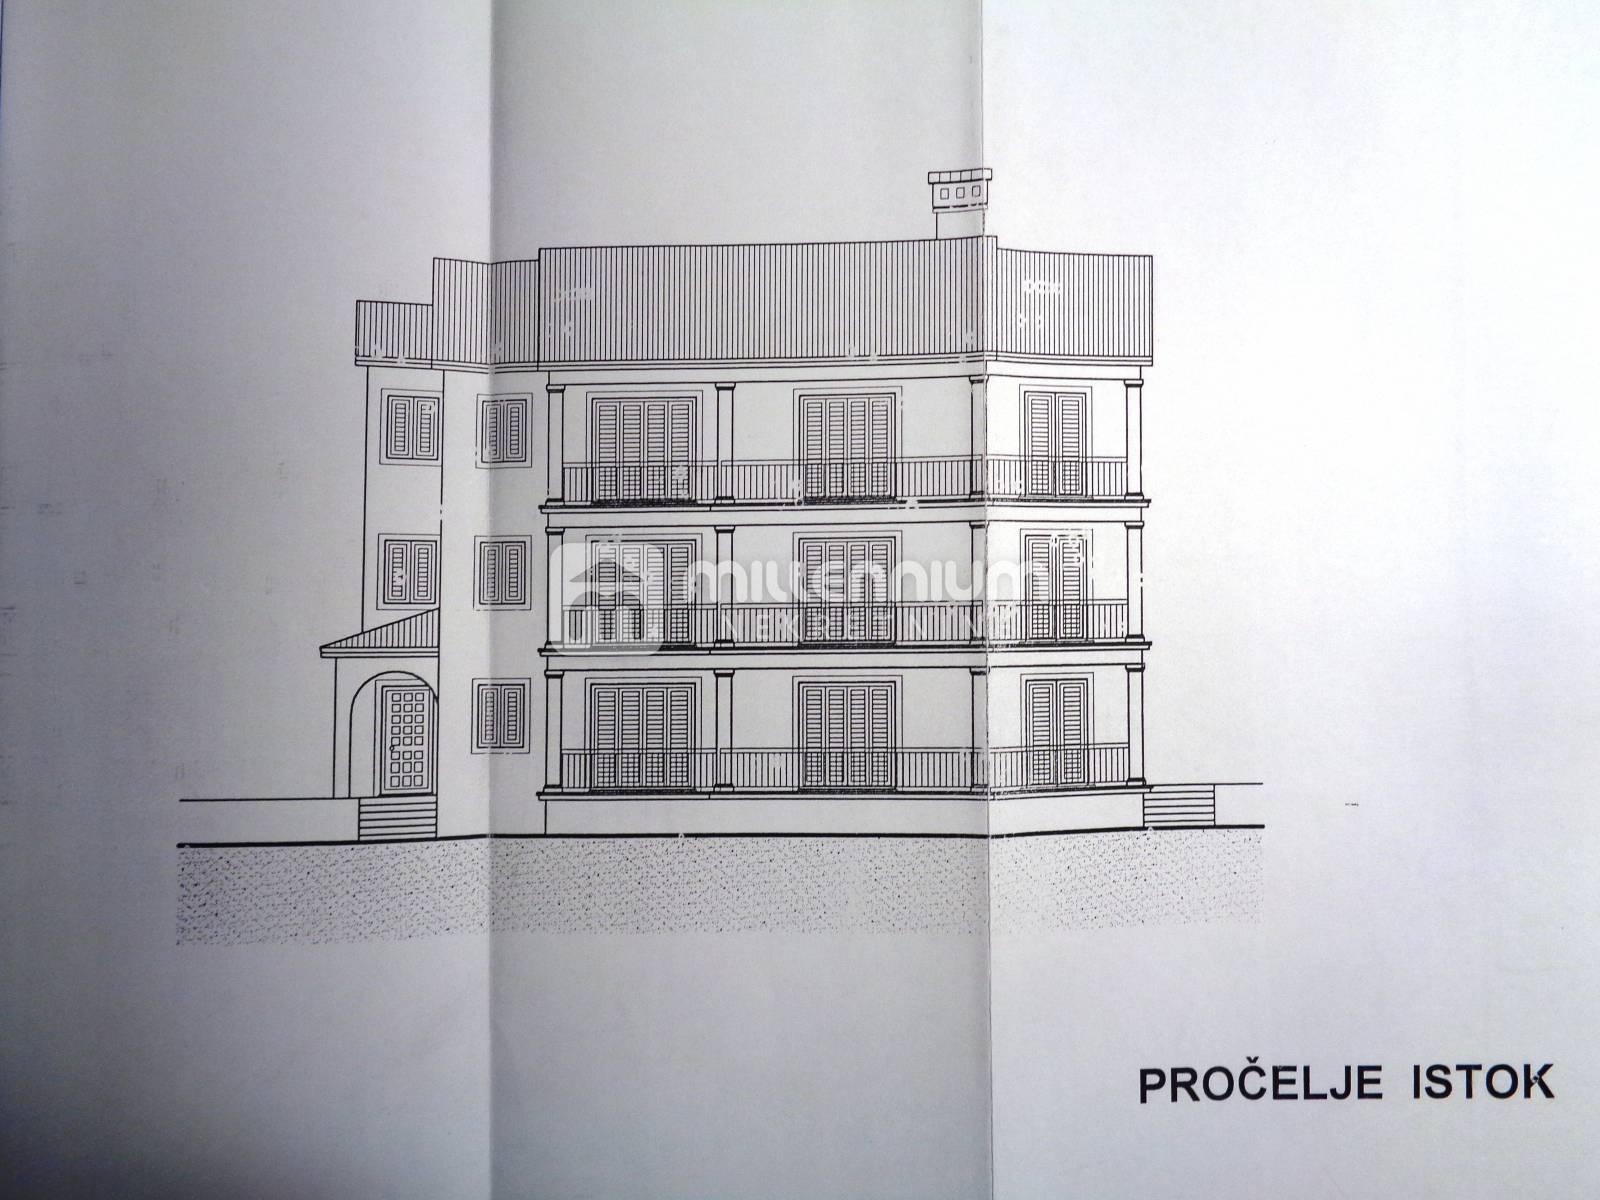 Opatija, Veprinac, građevinsko zemljište od 1.272m2